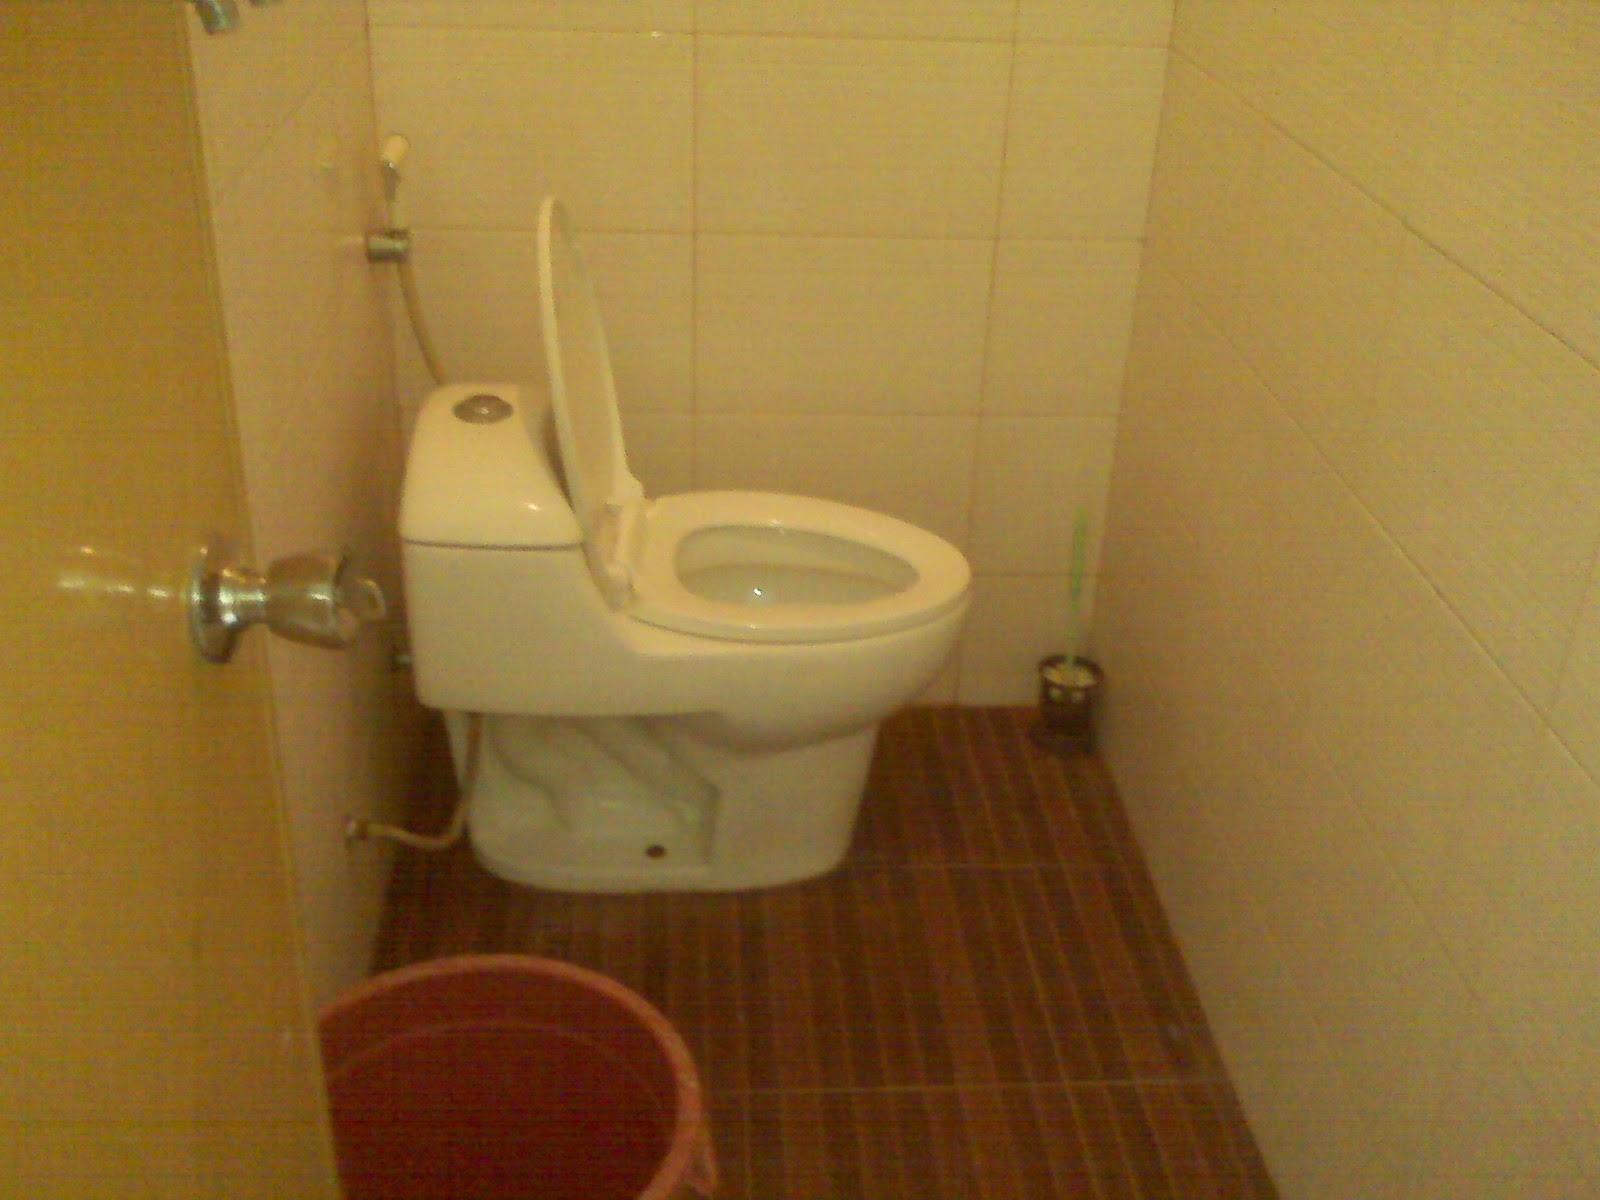 Kamar mandi Penginapan Sinar Pagi - http://pantaiku-ini.blogspot.com/2014/10/detail-penginapan-sinar-pagi.html